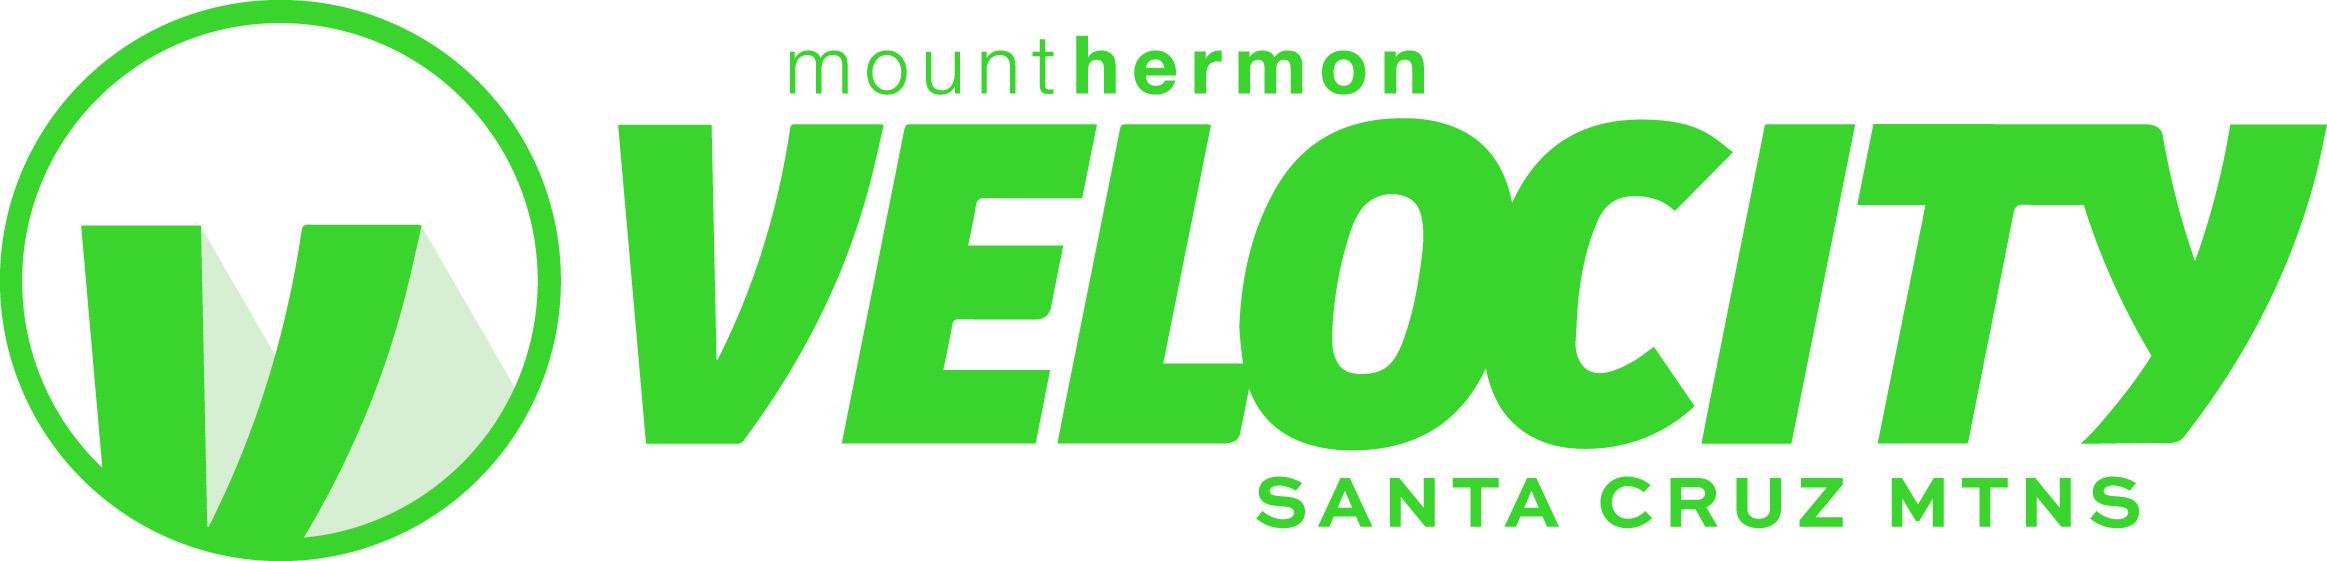 Velocity logo green.jpg